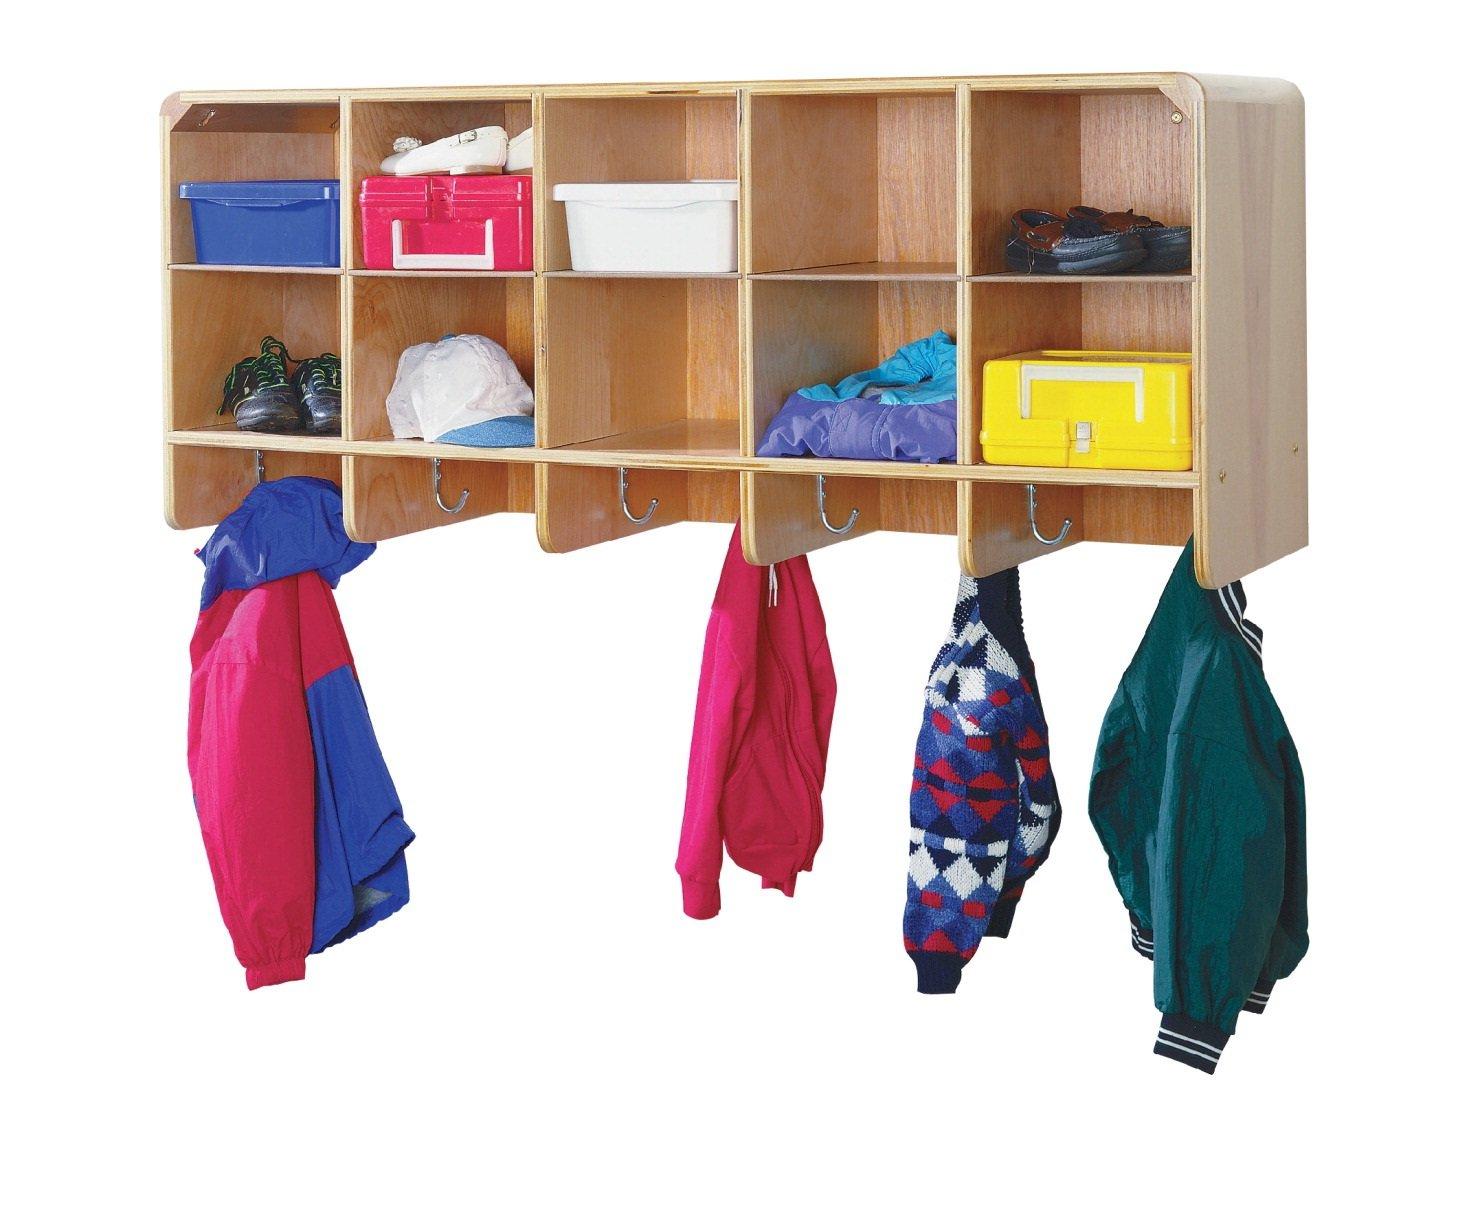 Korners for Kids 249474 Wall-Mounted Coat Locker, Wood, 47-3/4'' x 14-1/4'' x 19-3/4'', Natural Wood Tone